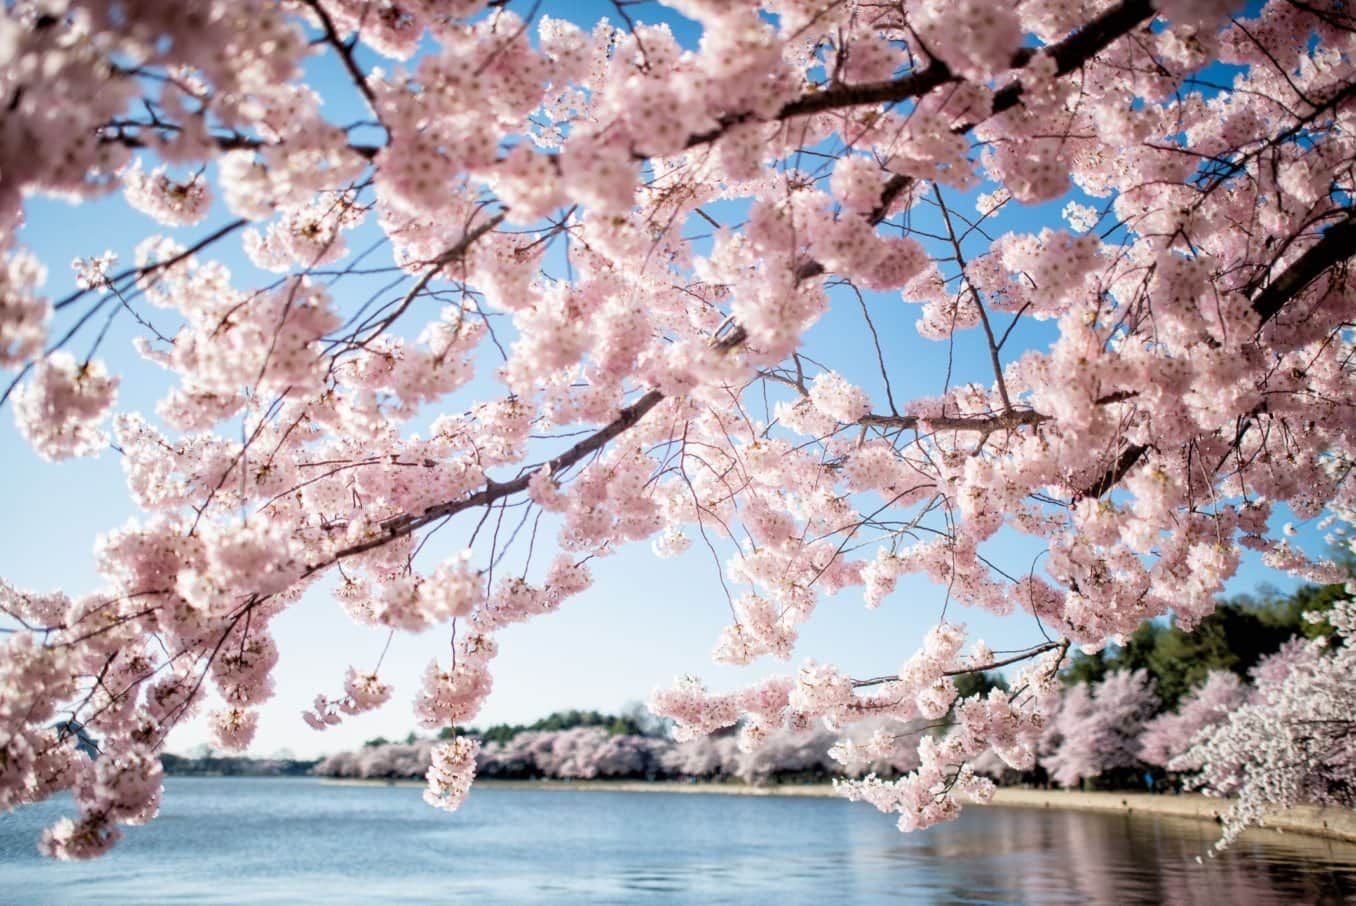 Washington Dc Cherry Blossoms April 1 2019 In 2020 Cherry Blossom Washington Dc Cherry Blossom Dc Blossom Trees